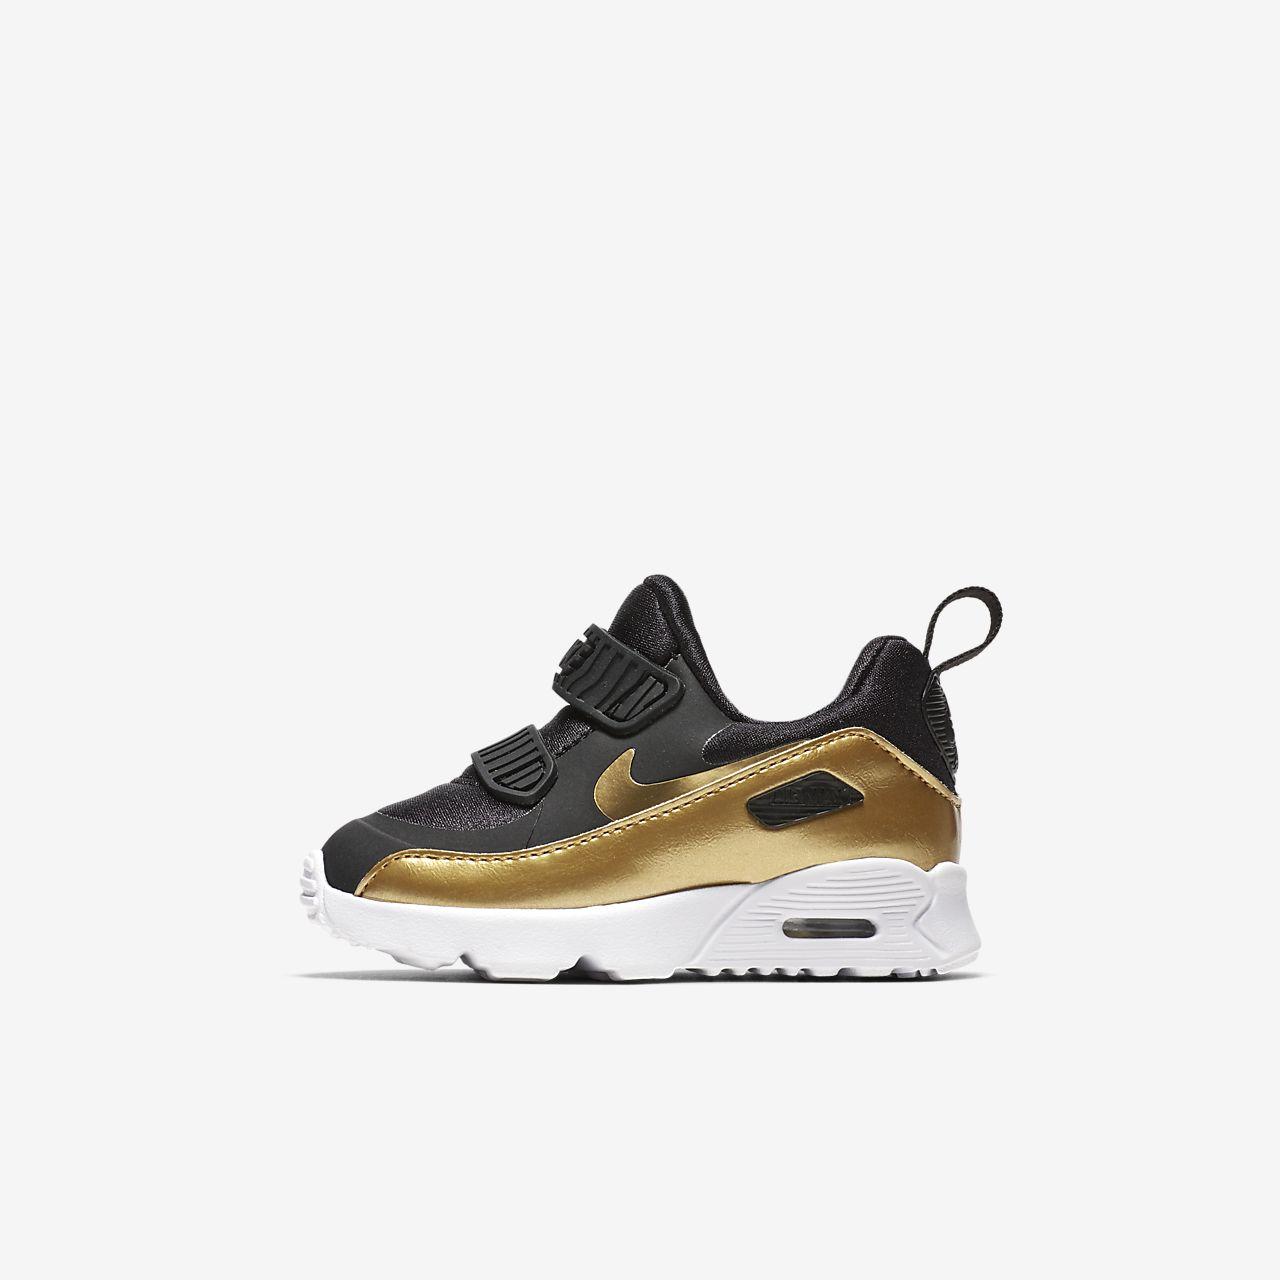 Nike Air Max Tiny 90 嬰幼兒鞋款